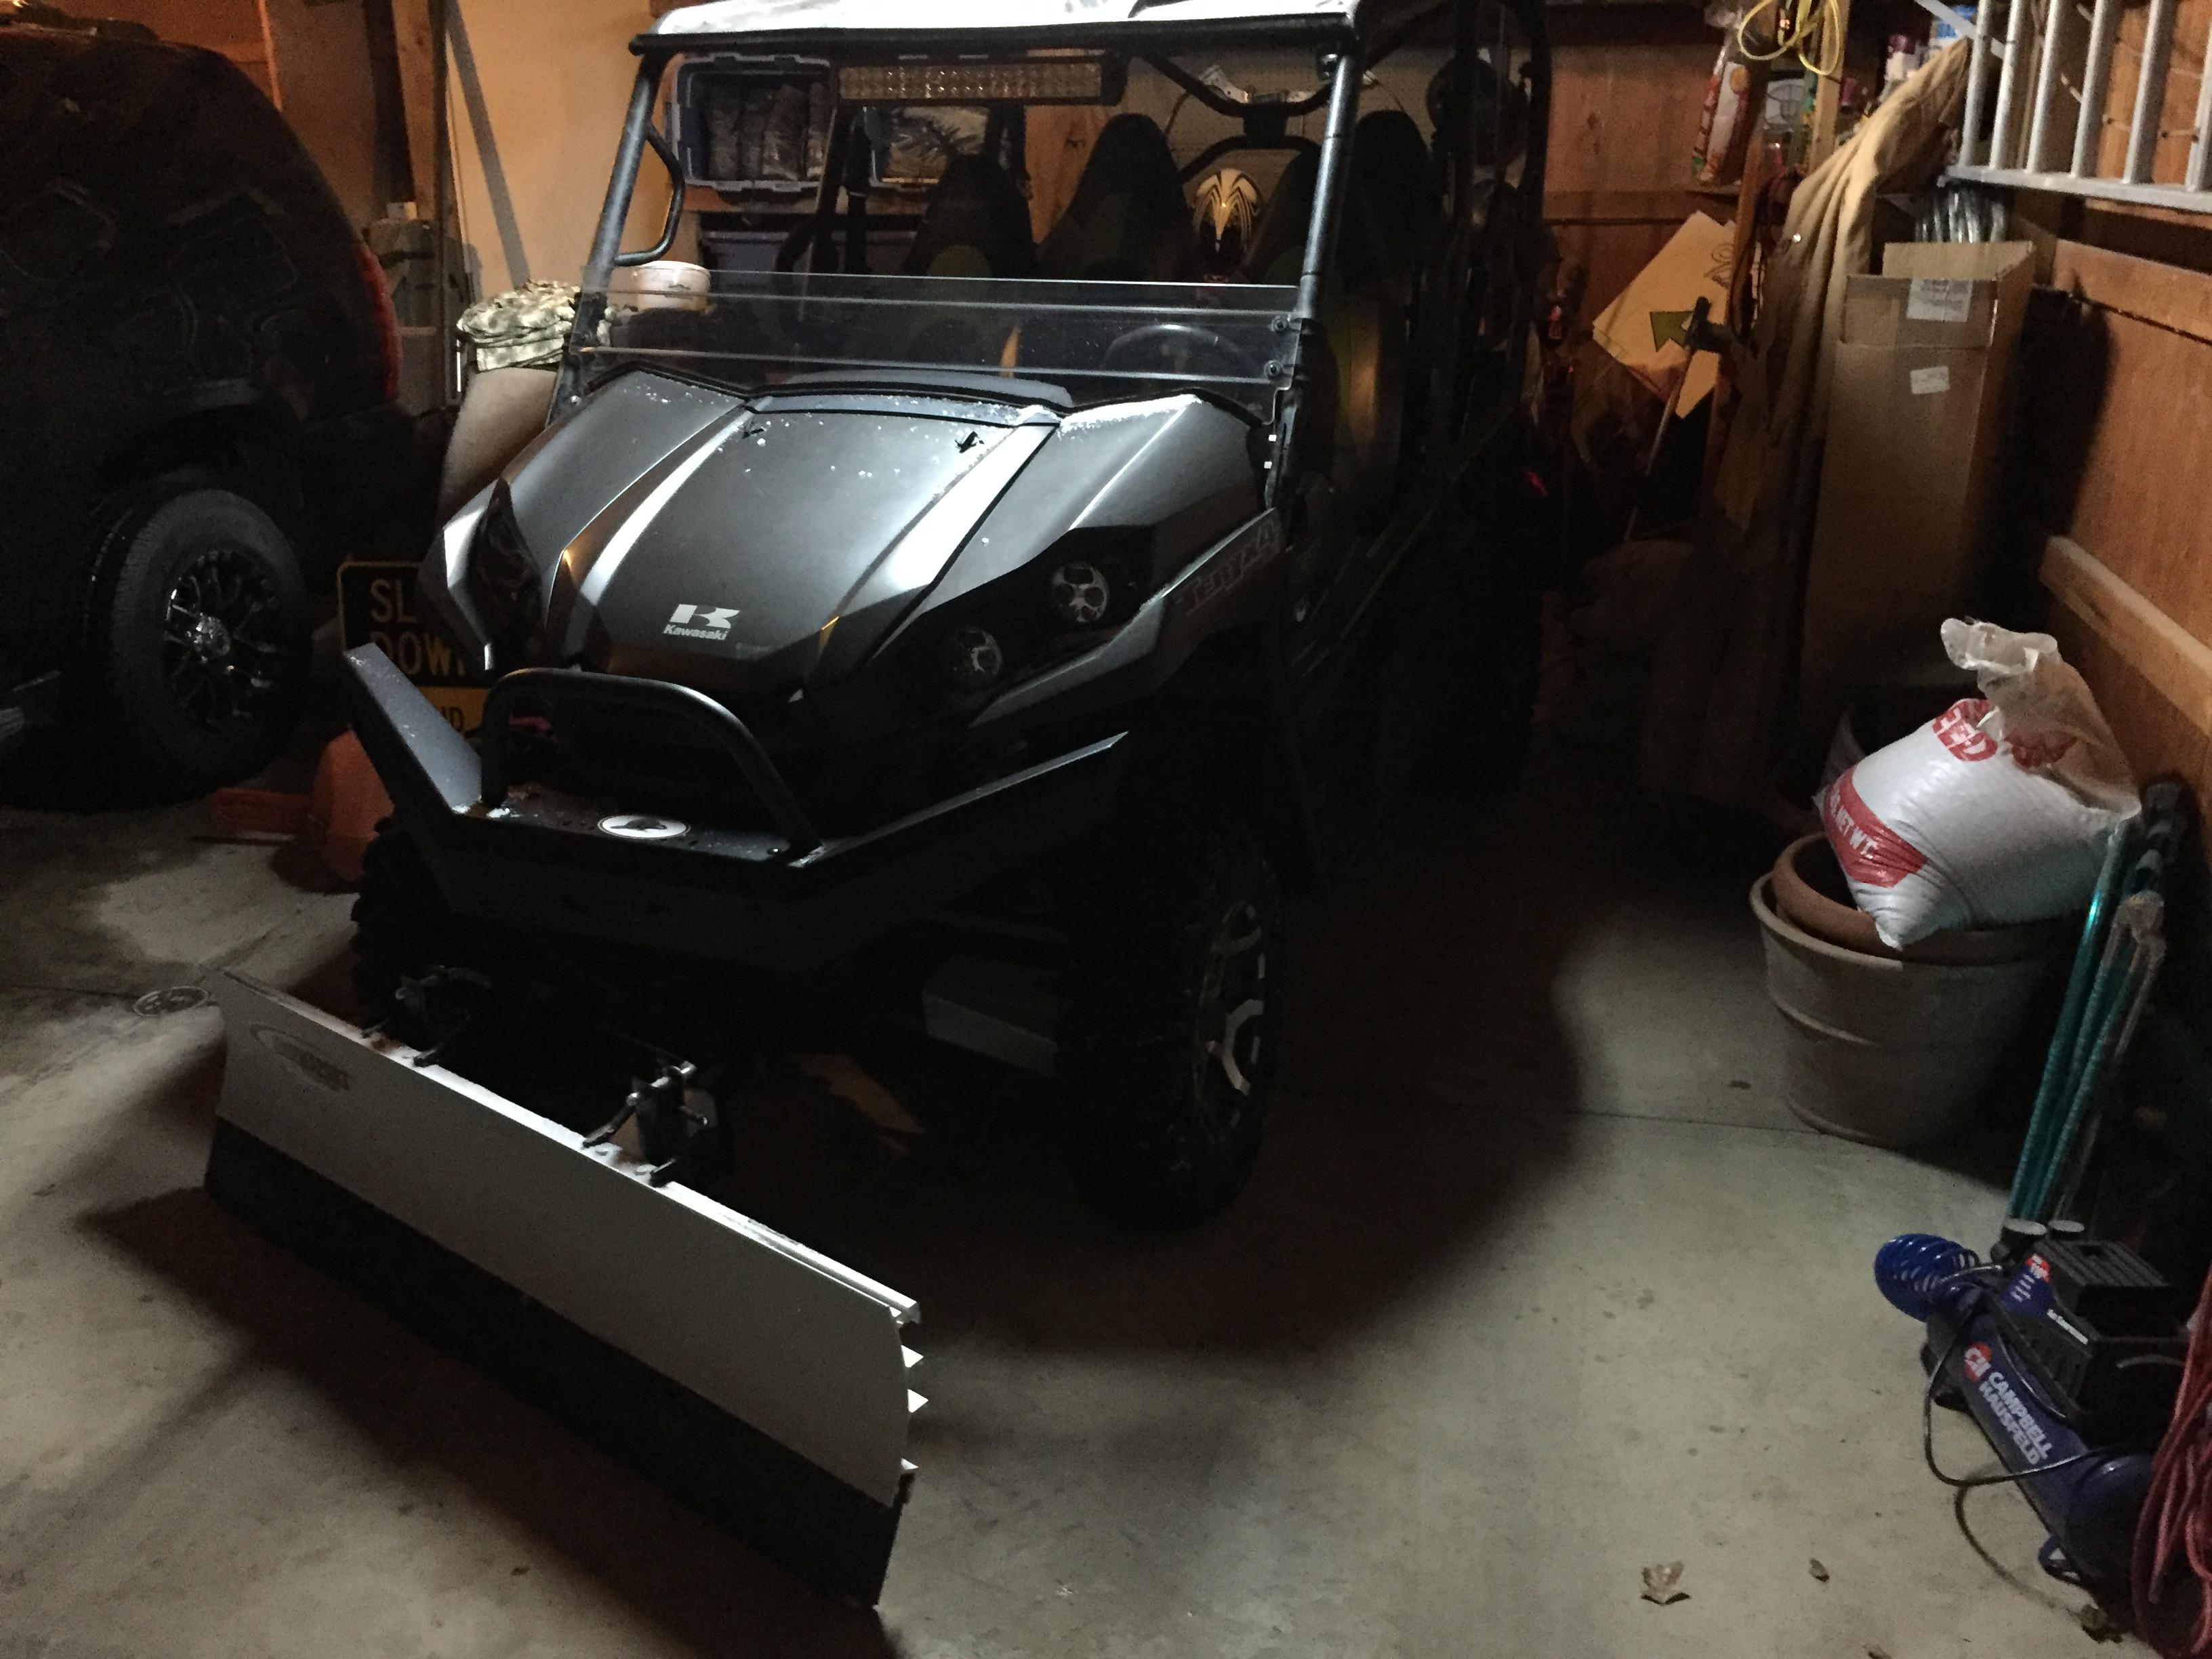 SnowSport ATV Snow Plow